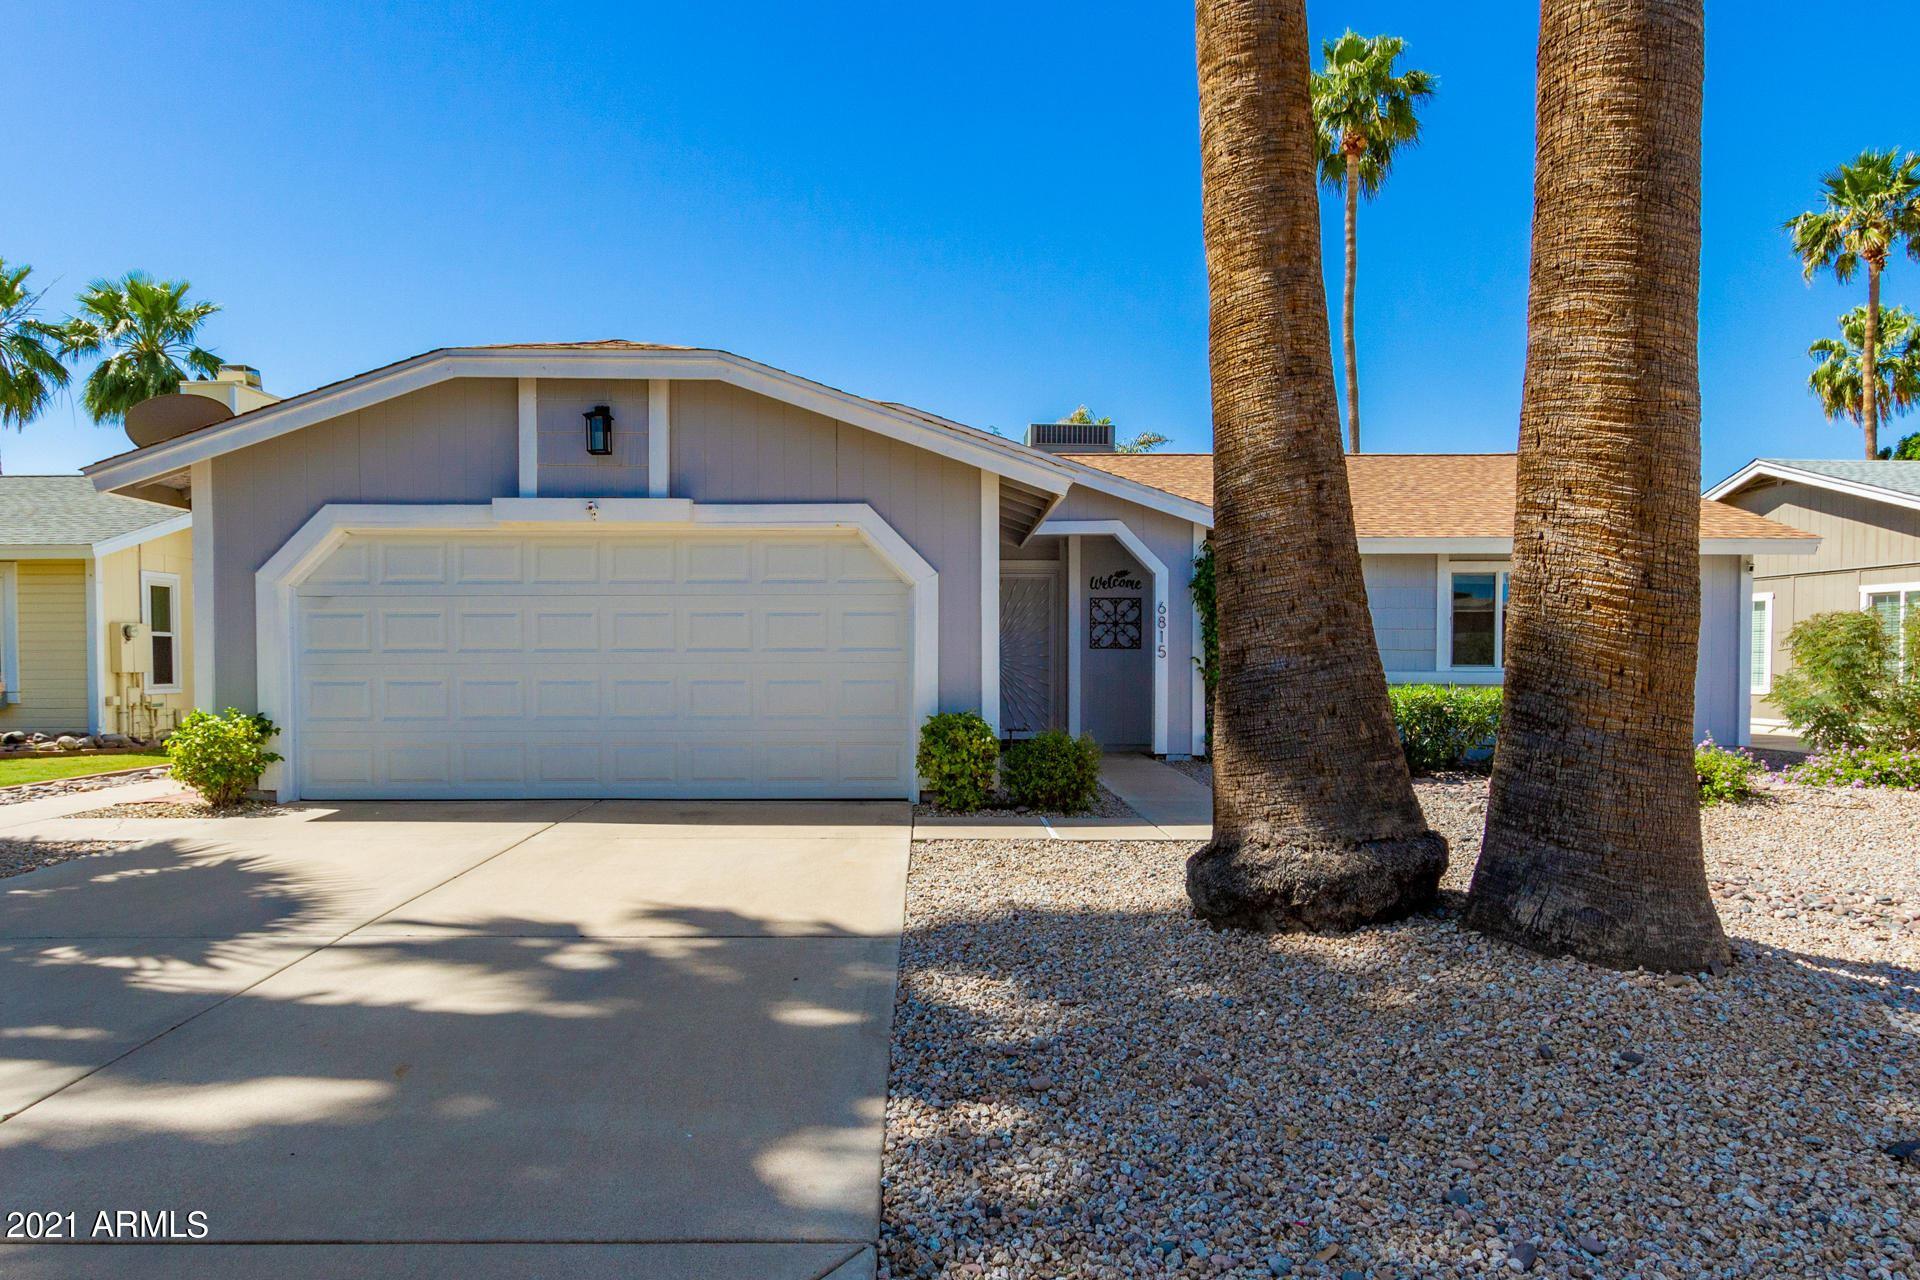 6815 E SANDRA Terrace, Scottsdale, AZ 85254 - MLS#: 6231572